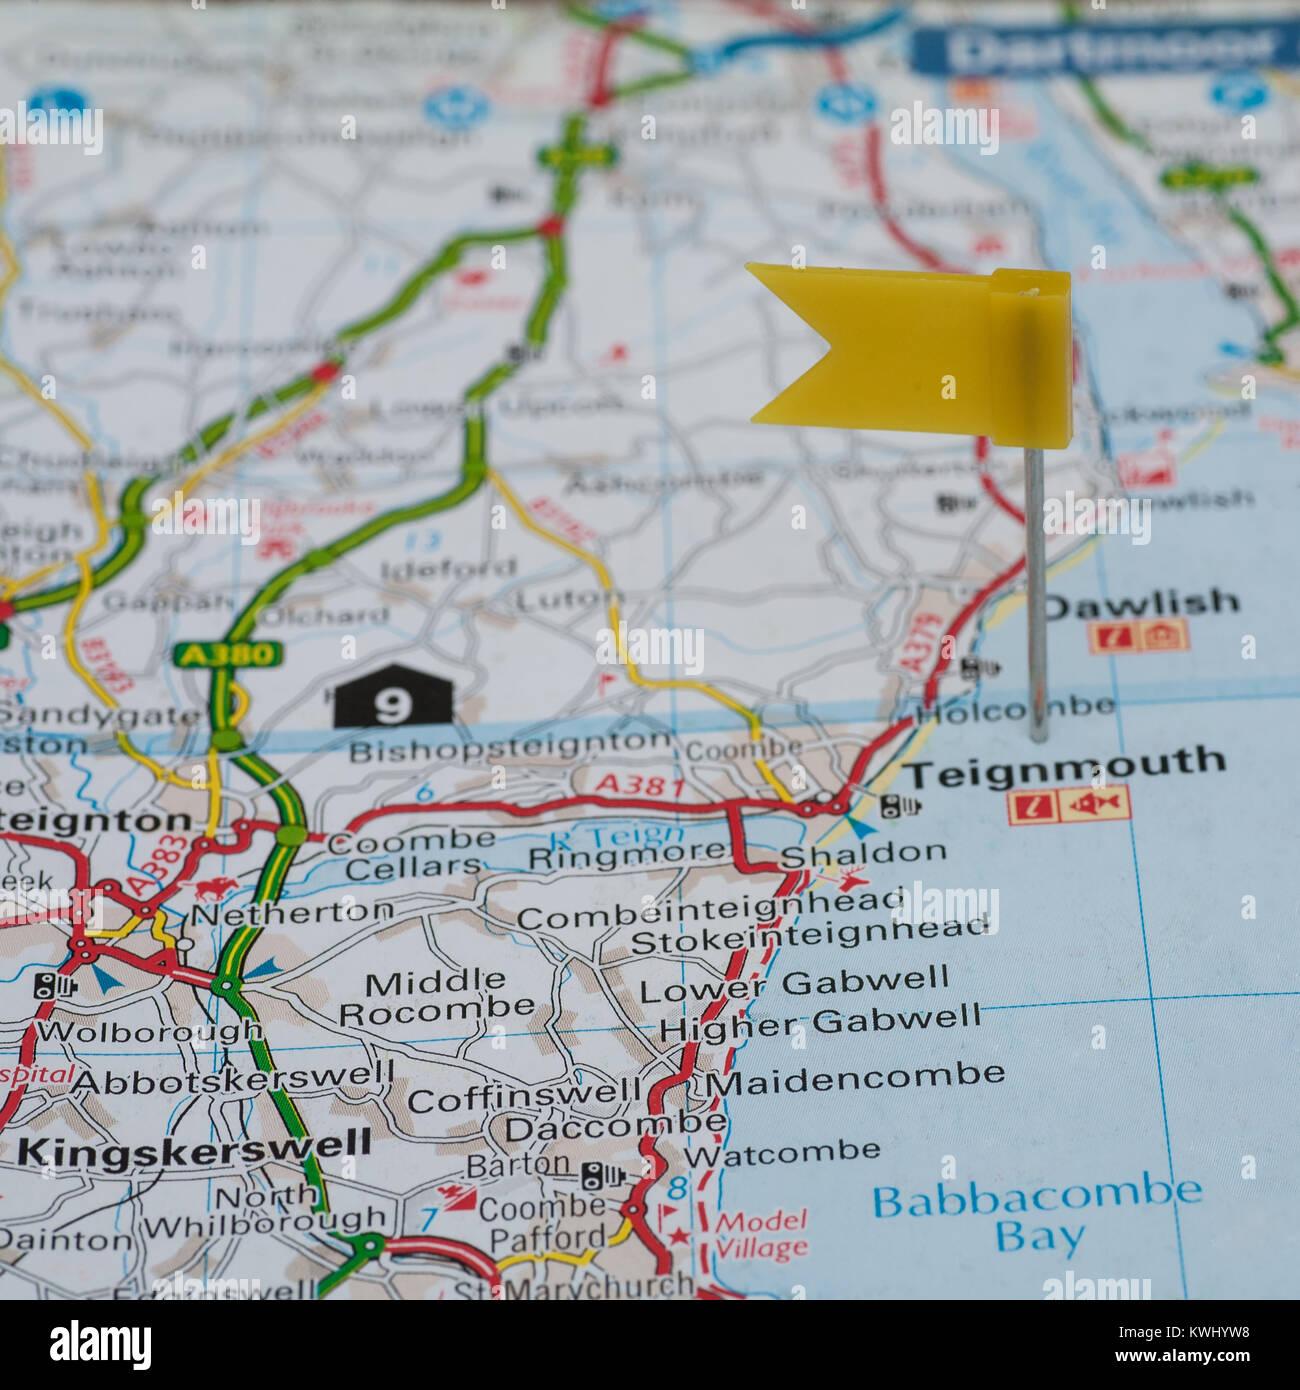 Devon Map - Stock Image